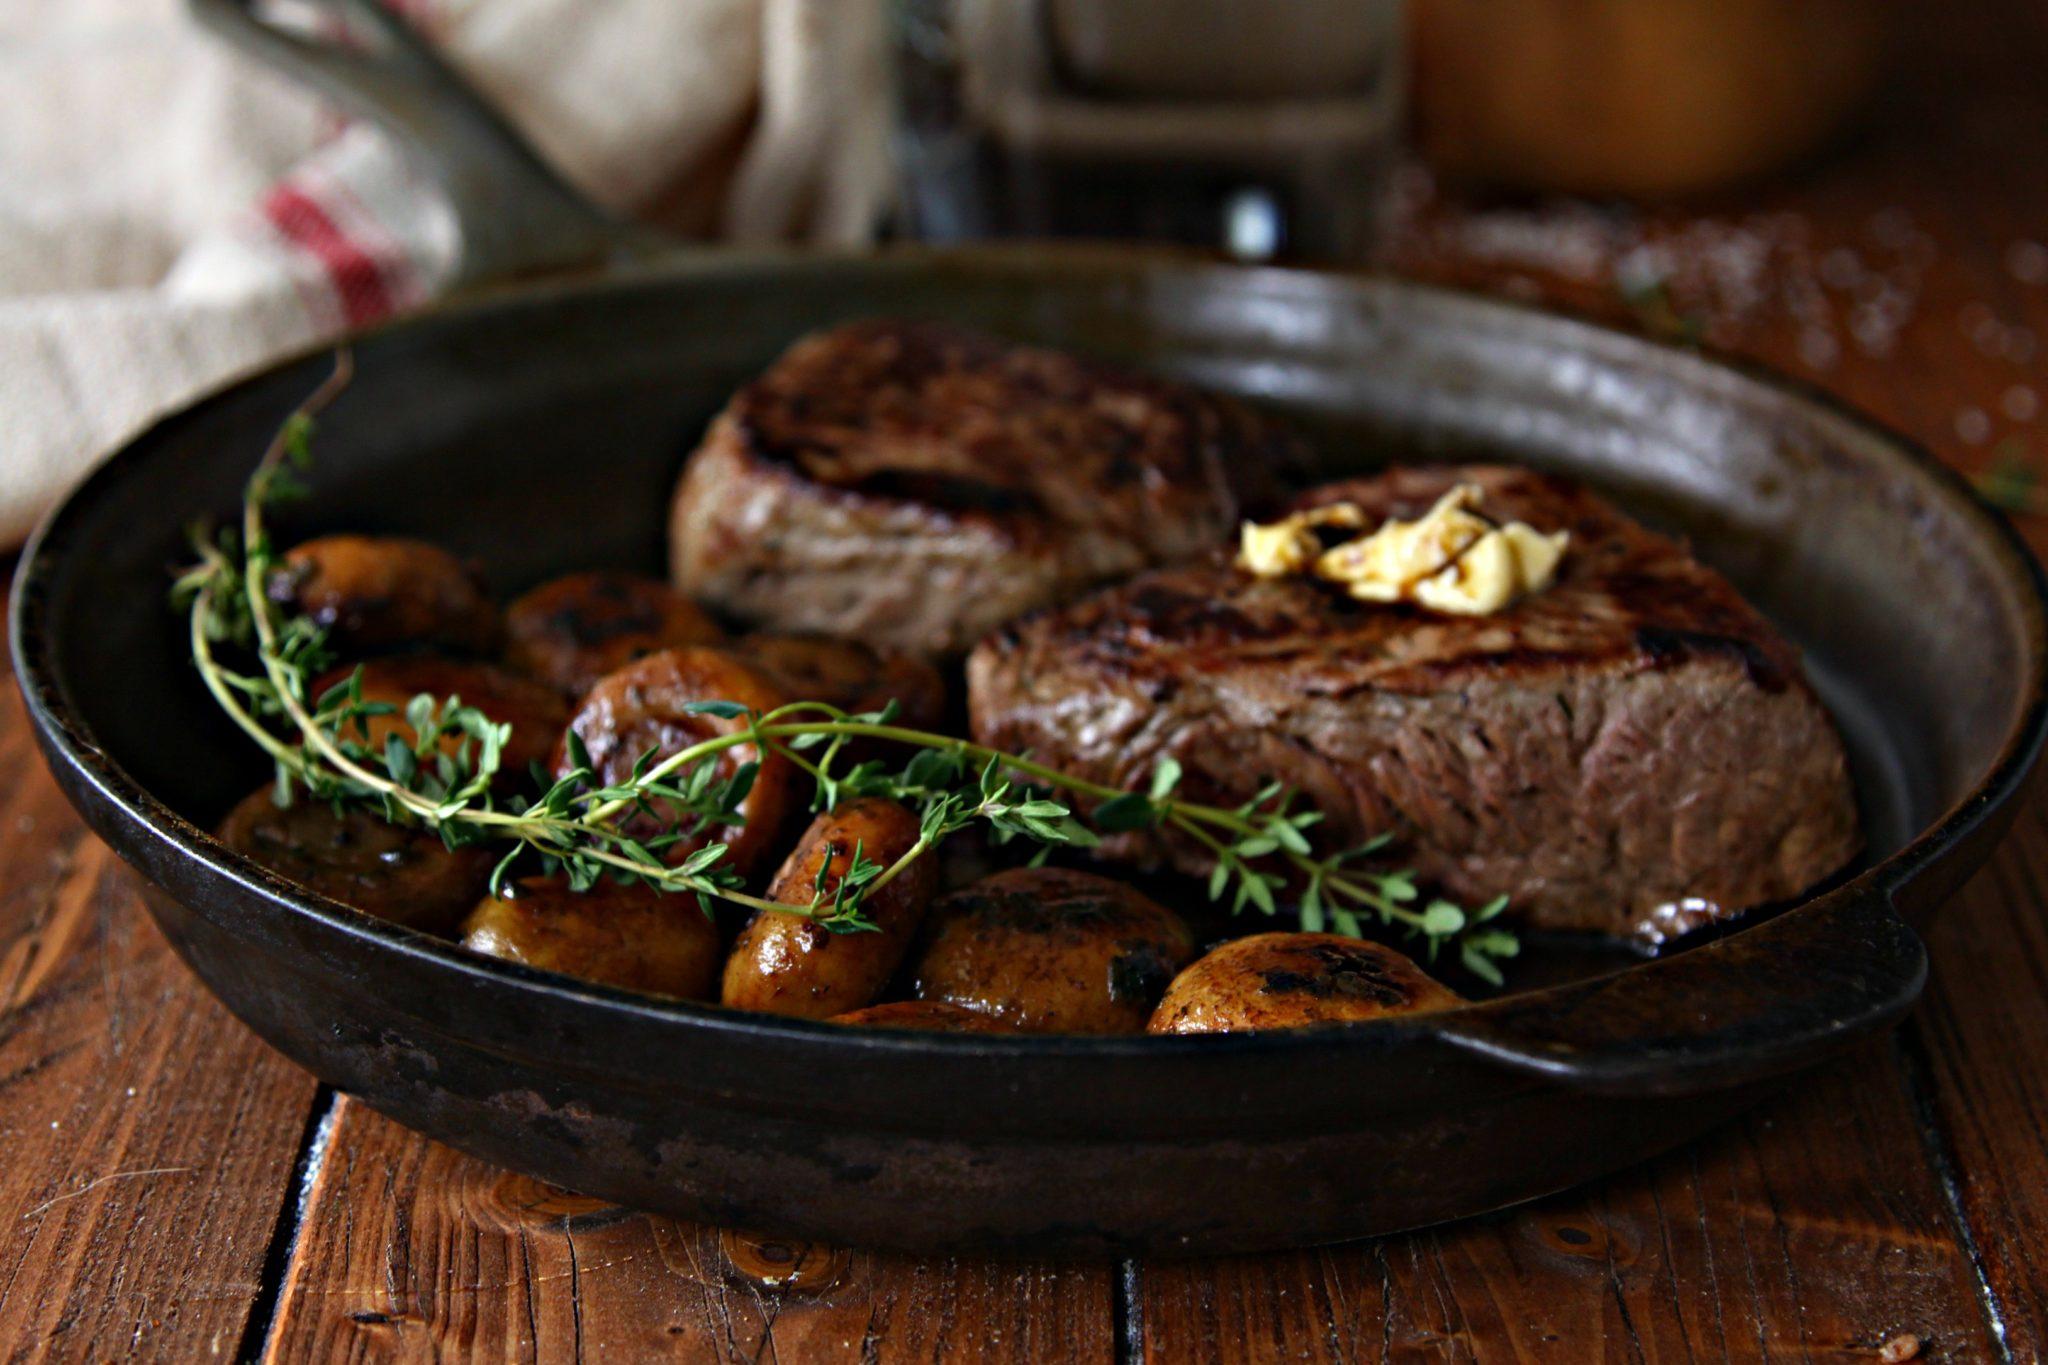 Steak with Sauteed Mushrooms and Chianti Caramel Sauce ...